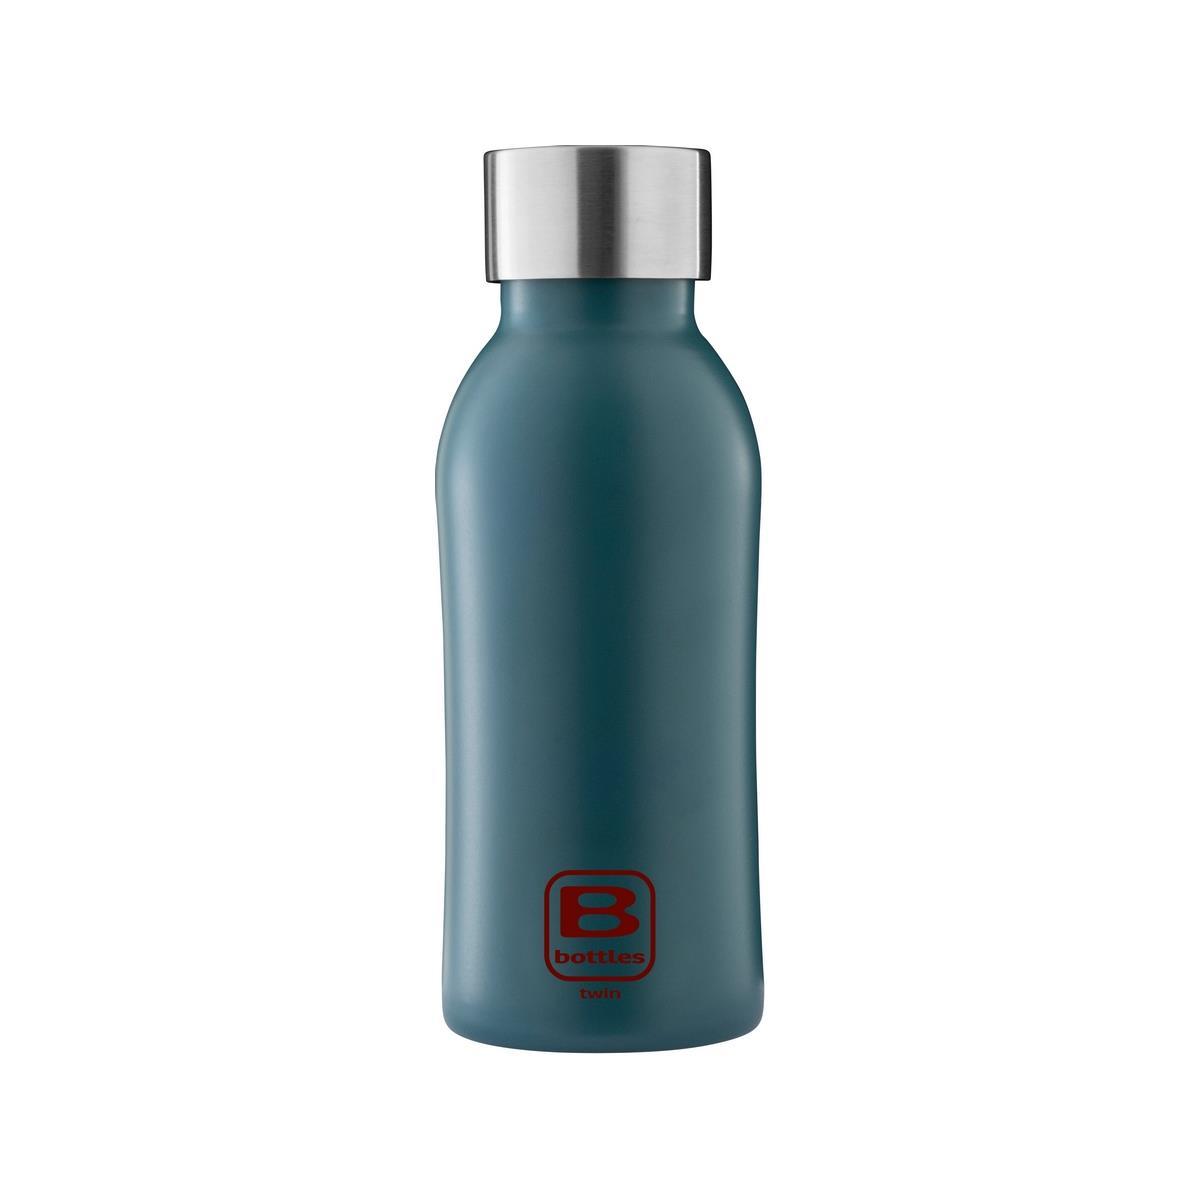 B Bottles Twin - Teal Blue - 350 ml - Bottiglia Termica a doppia parete in acciaio inox 18/10